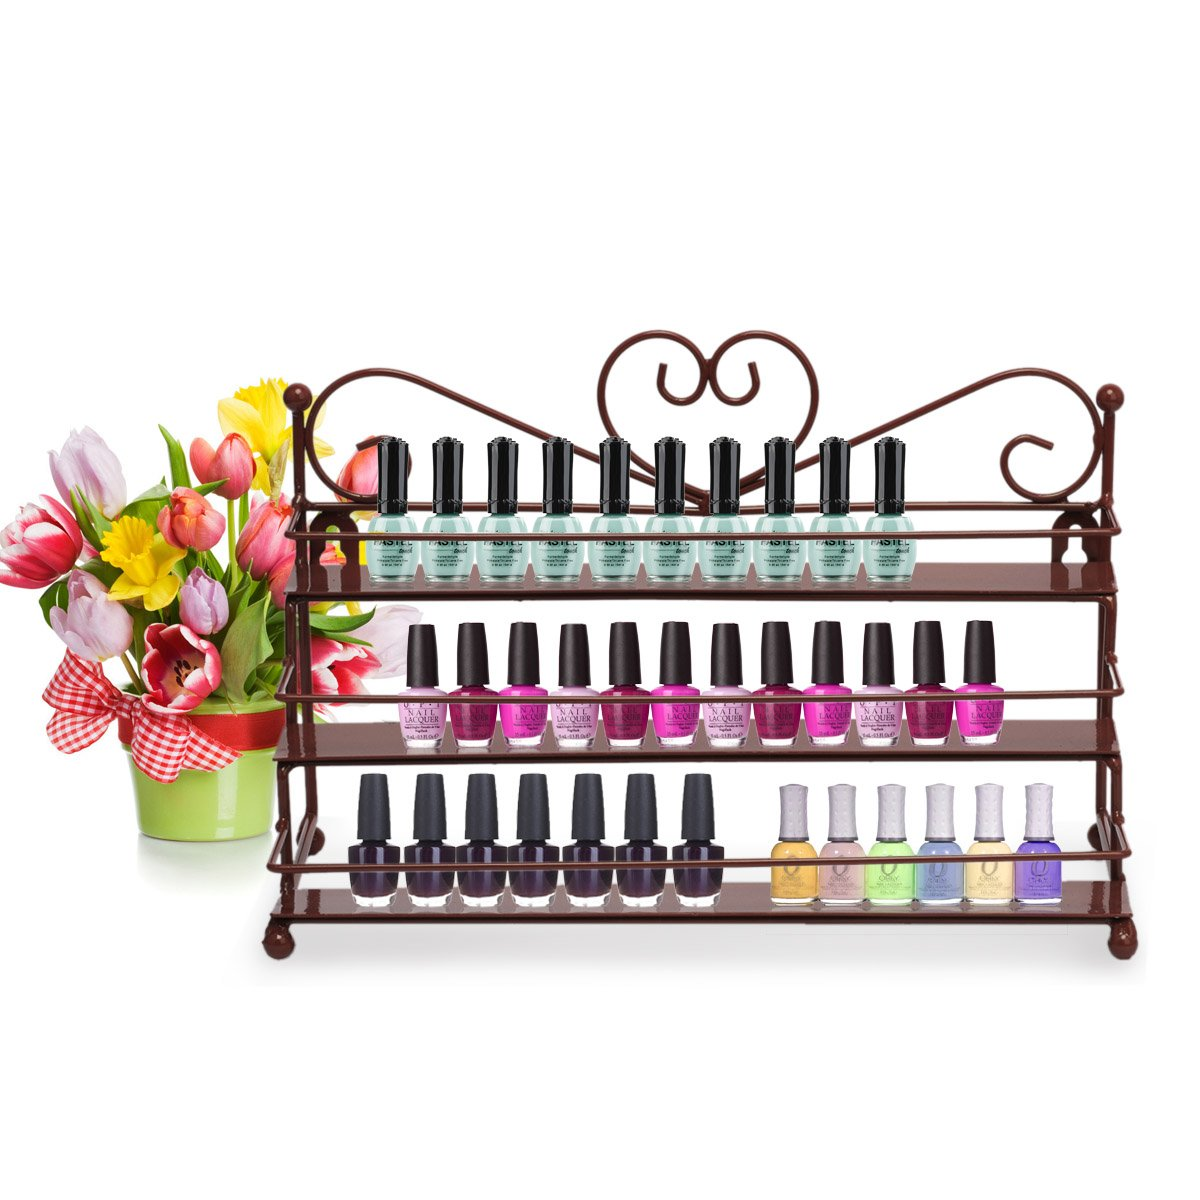 Dazone Mounted 3 Tier Metal Shelf Nail Polish Wall Rack Essential Oils Perfume Organizer by DAZONE (Image #7)